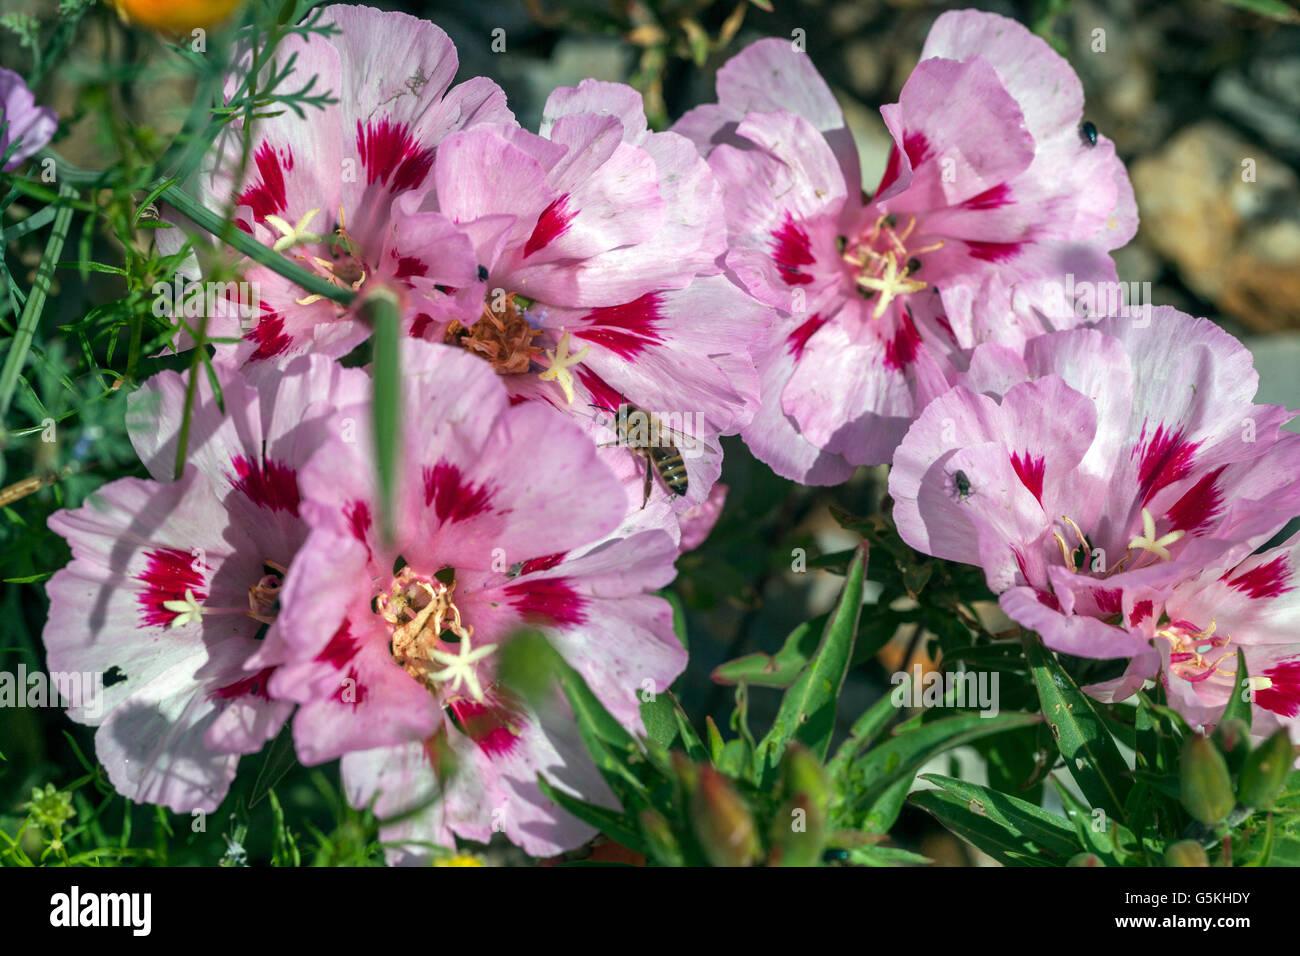 meadow-flowers-G5KHDY.jpg